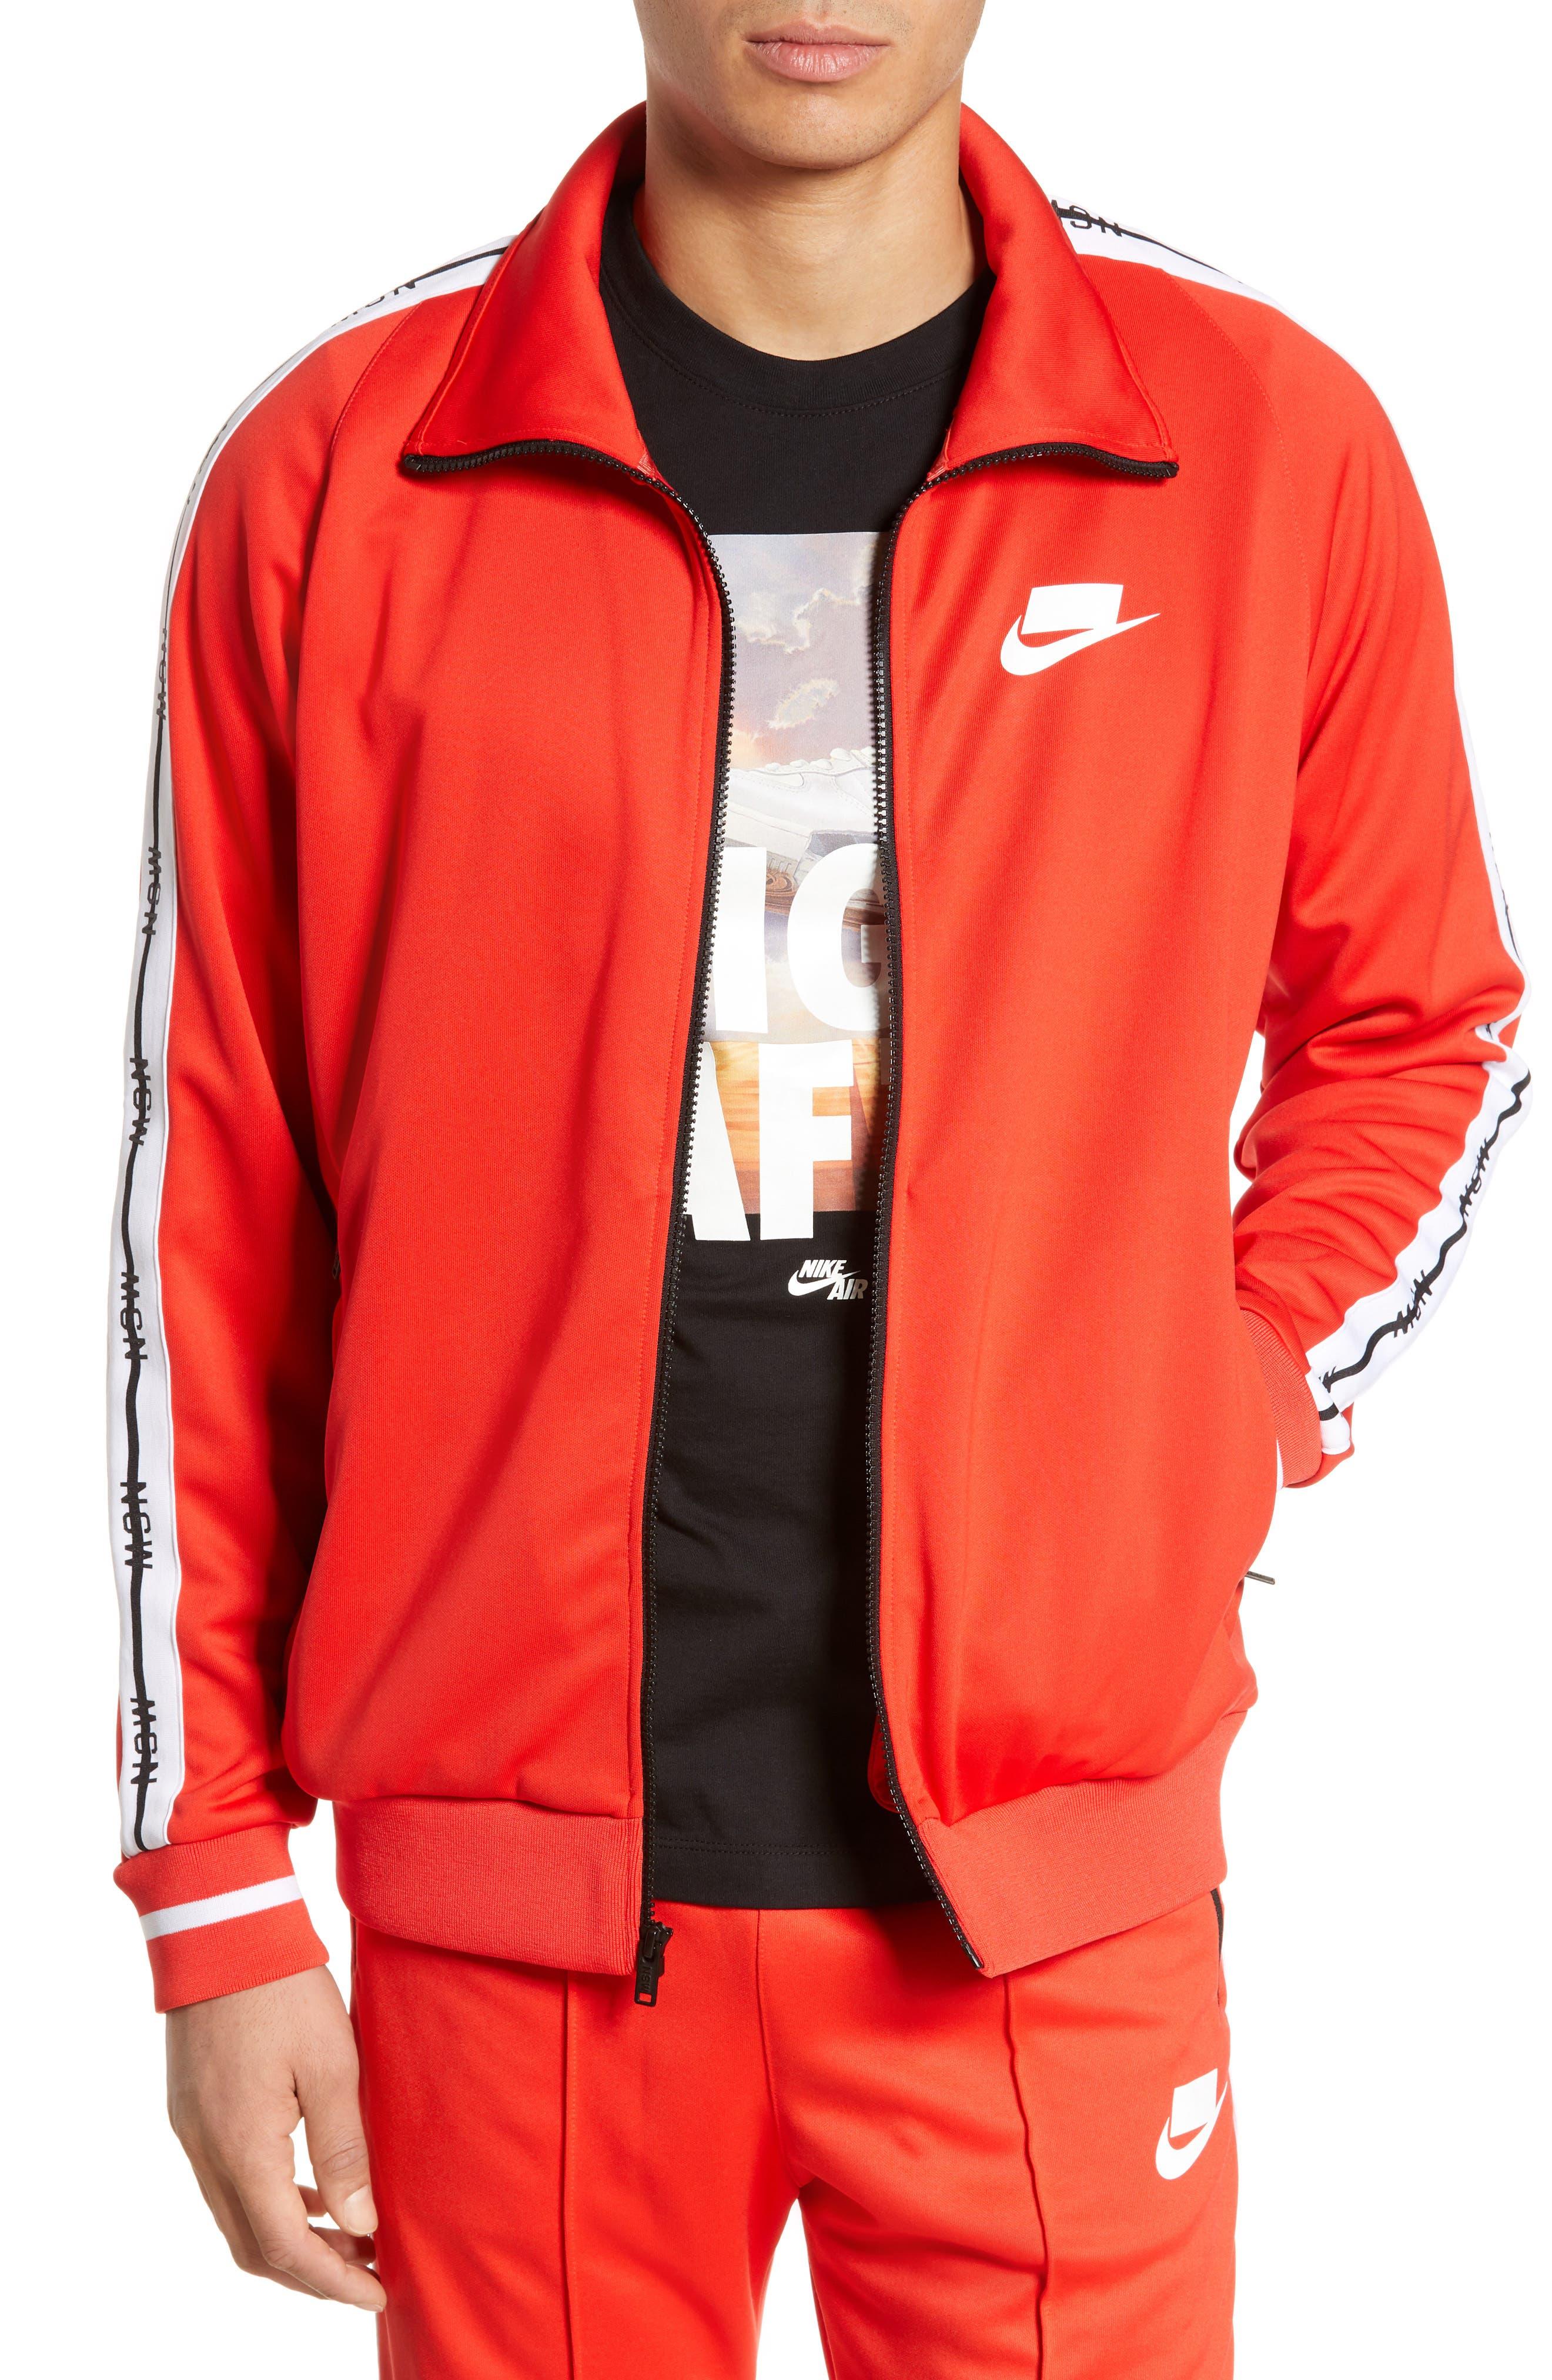 2495121911b9 Nike Men s Running Jackets   Vests